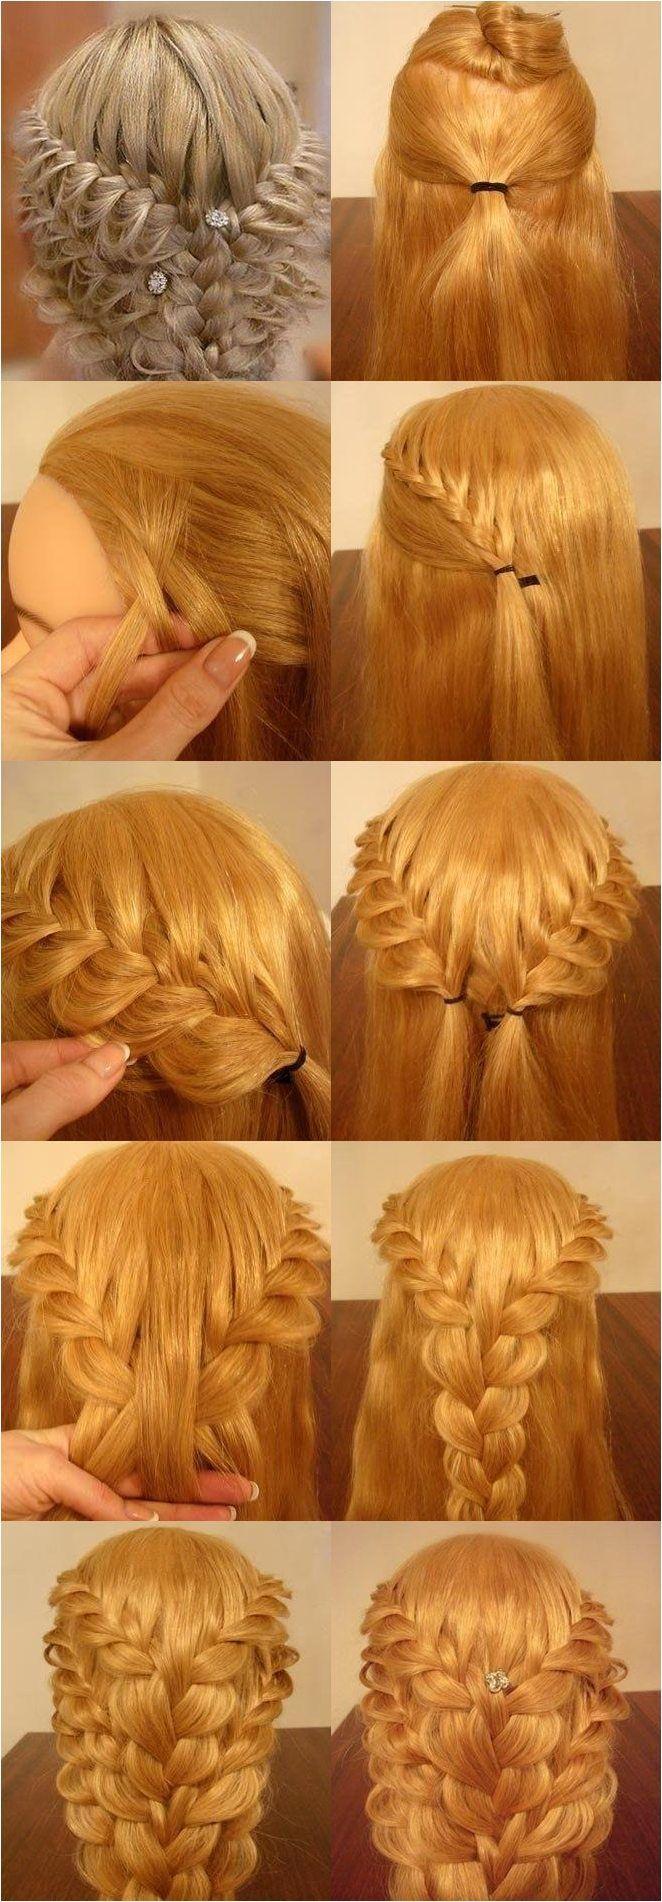 Fantastic 1000 Ideas About Easy Elegant Hairstyles On Pinterest Romantic Short Hairstyles For Black Women Fulllsitofus